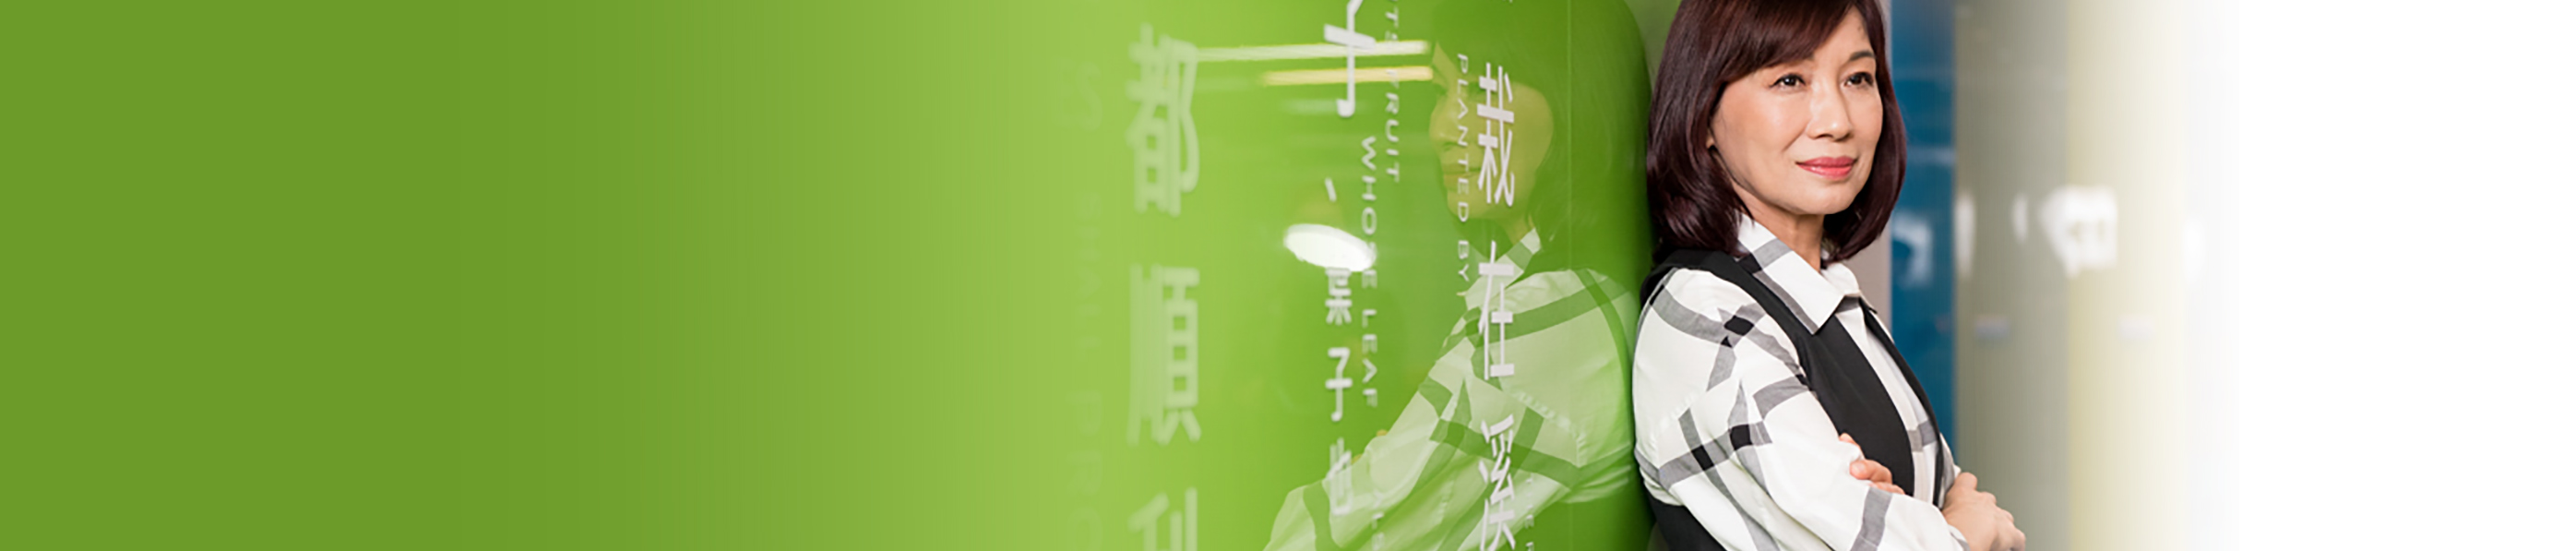 Exchange jp. 採訪